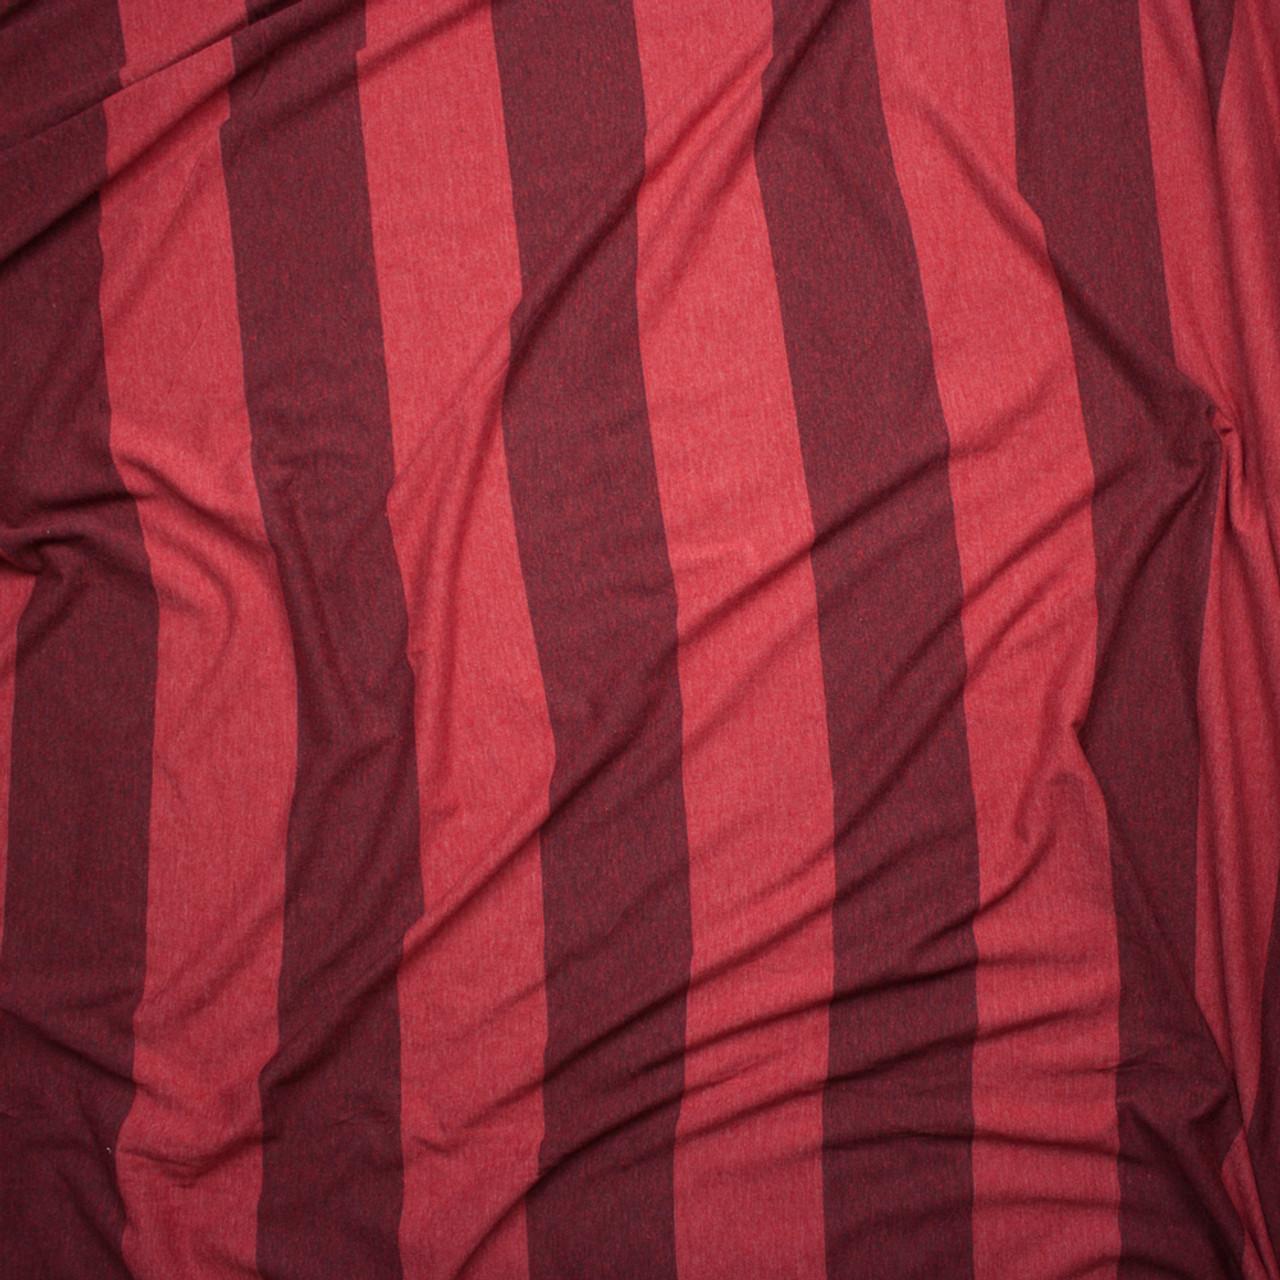 6ec7d1f9372 ... Brick Red Wide Stripe Lightweight Jersey Knit Fabric By The Yard - Wide  shot